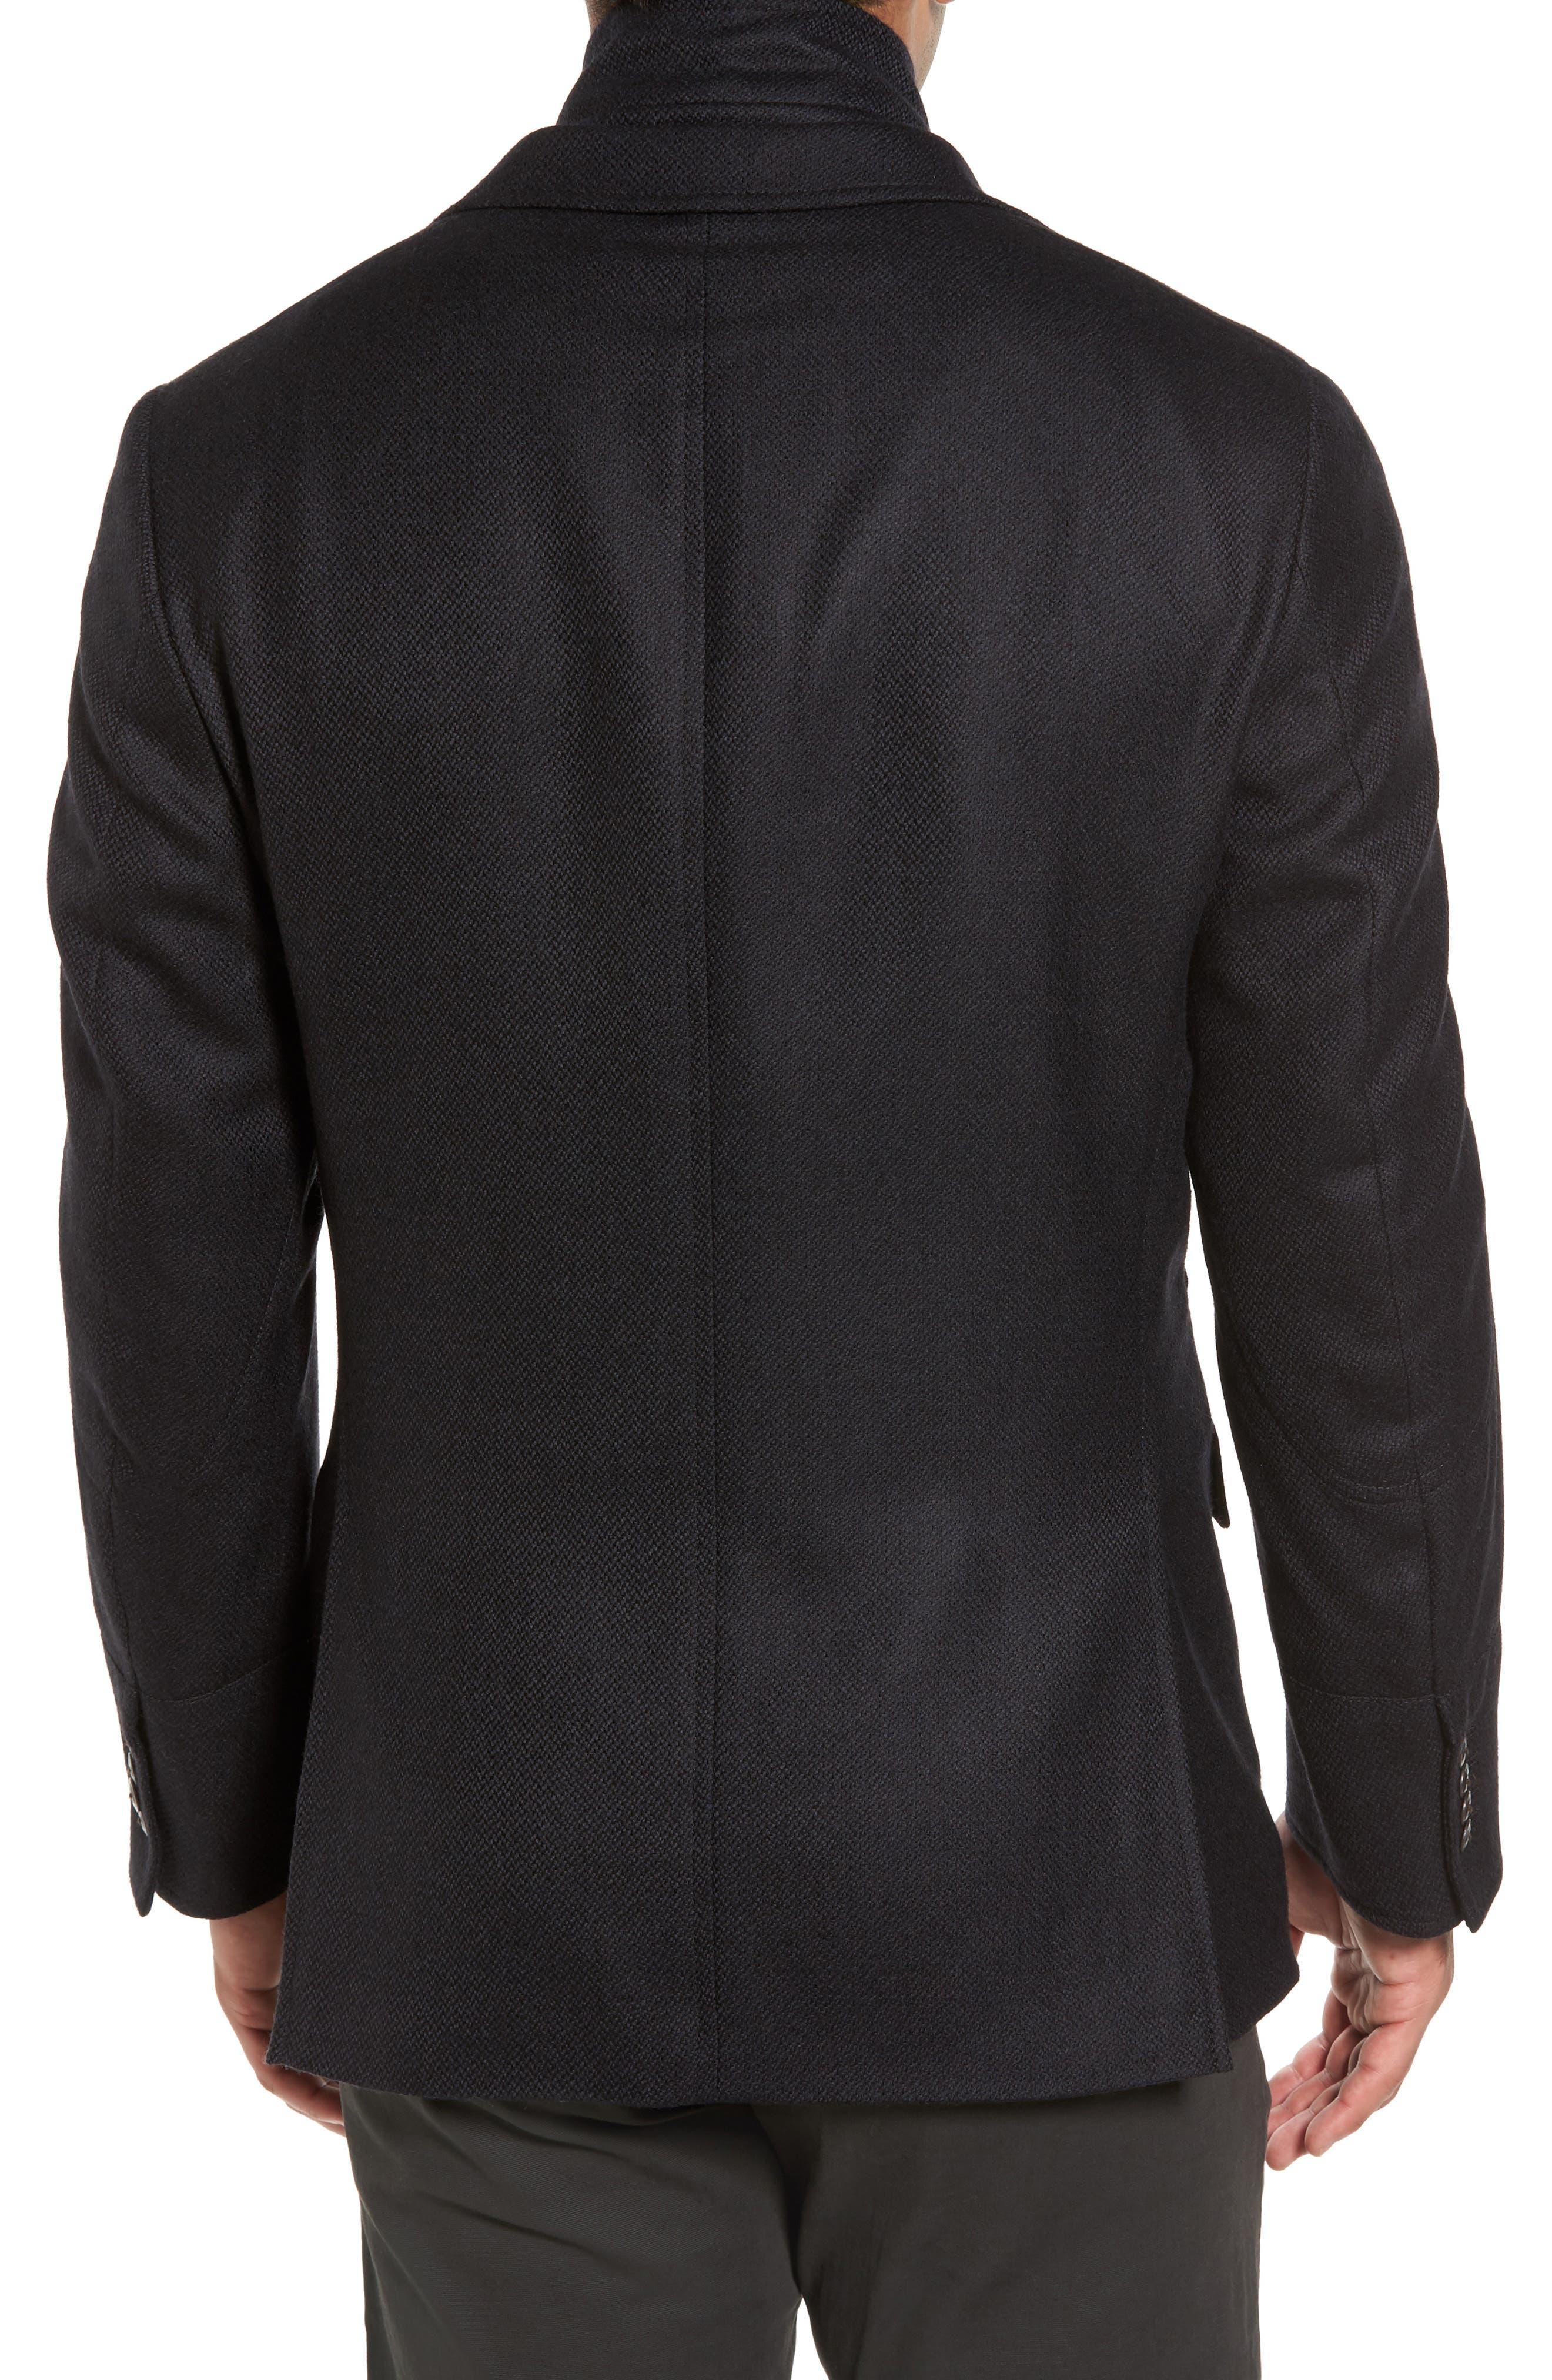 Ritchie Aim Hybrid Classic Fit Wool & Cashmere Sport Coat,                             Alternate thumbnail 2, color,                             001